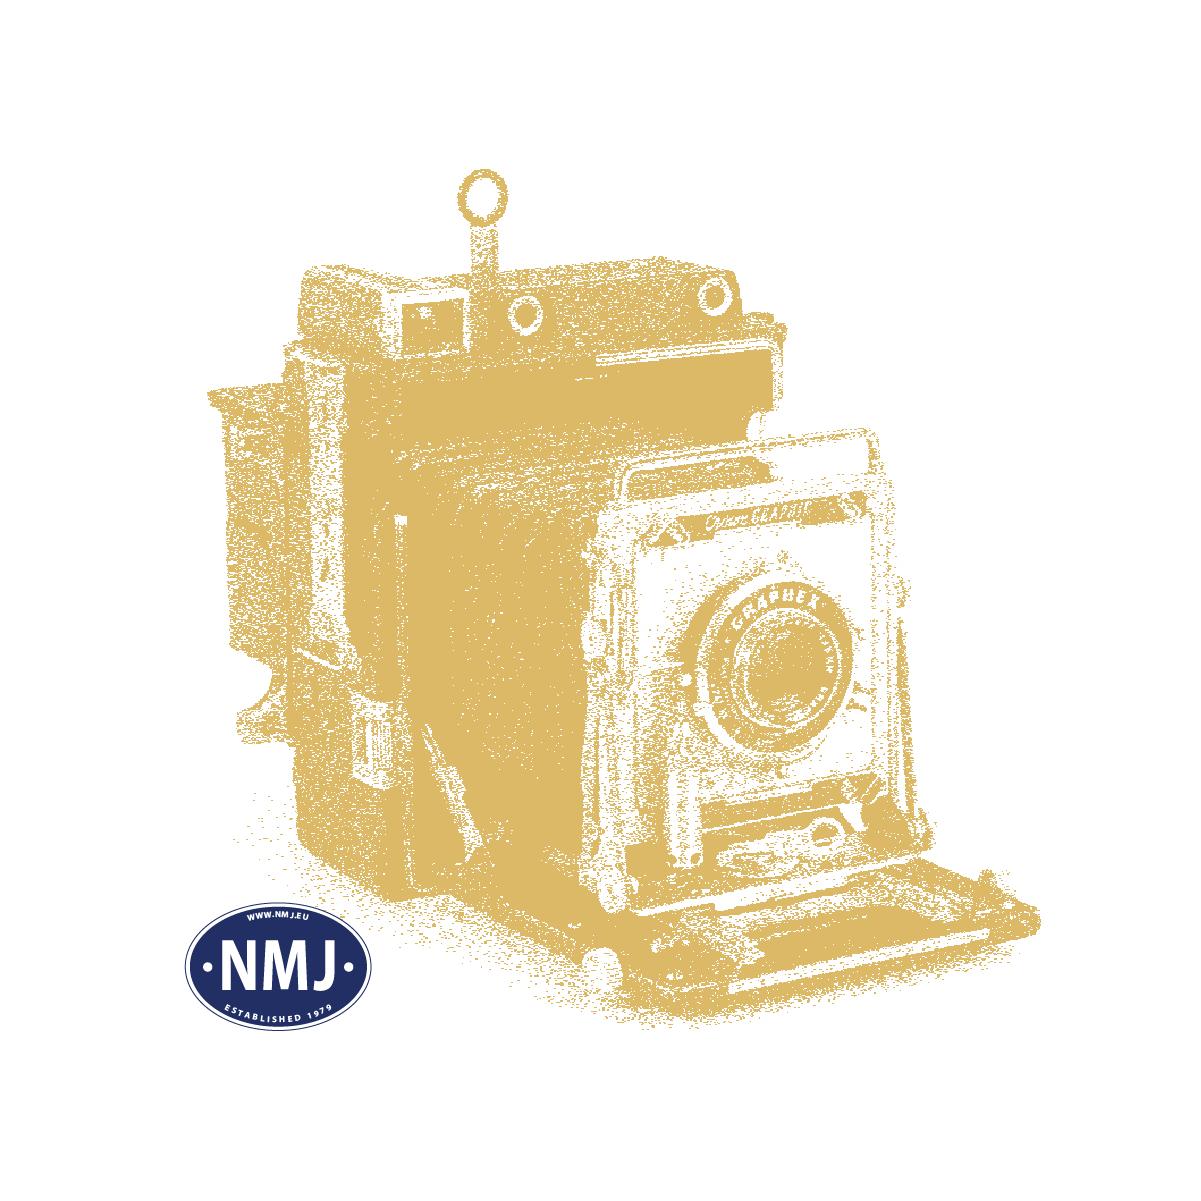 NMJT504.202 - NMJ Topline NSB His 210 2 885-1